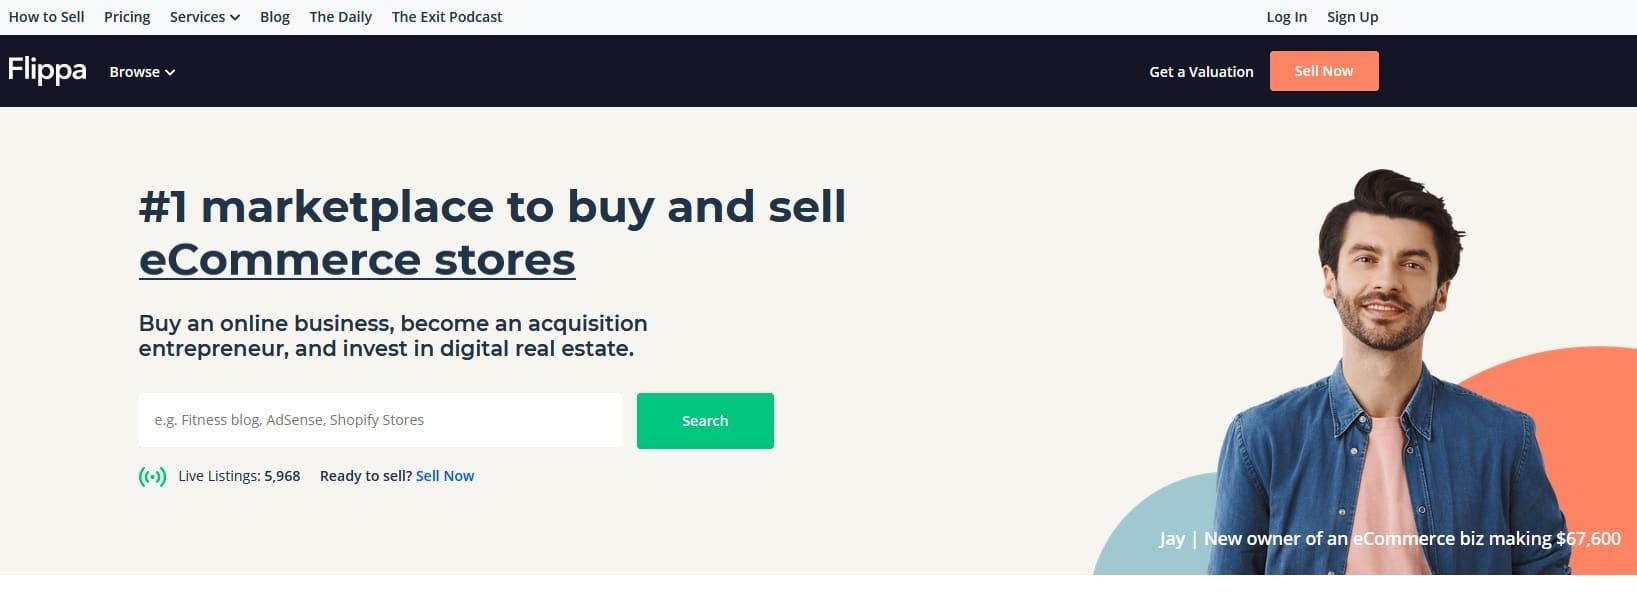 Flippa website marketplace